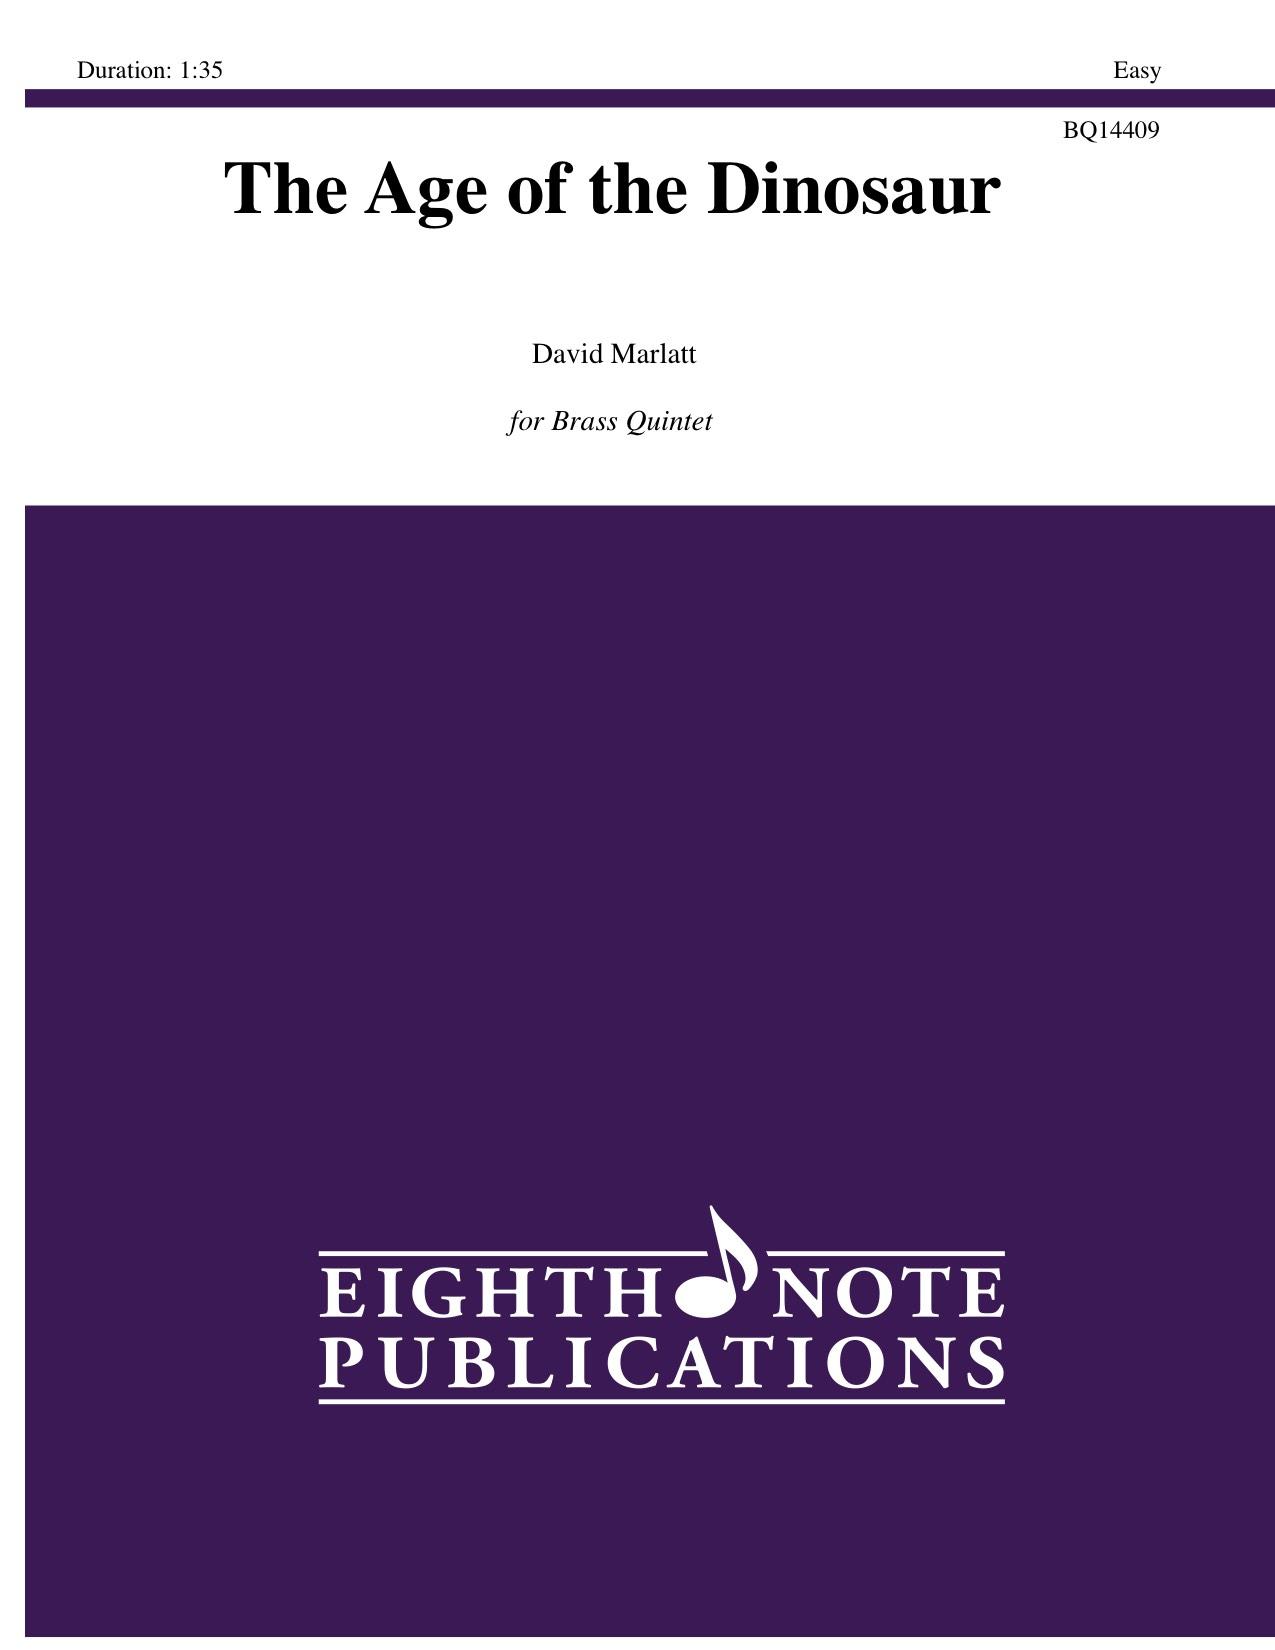 Age of the Dinosaur, The - David Marlatt